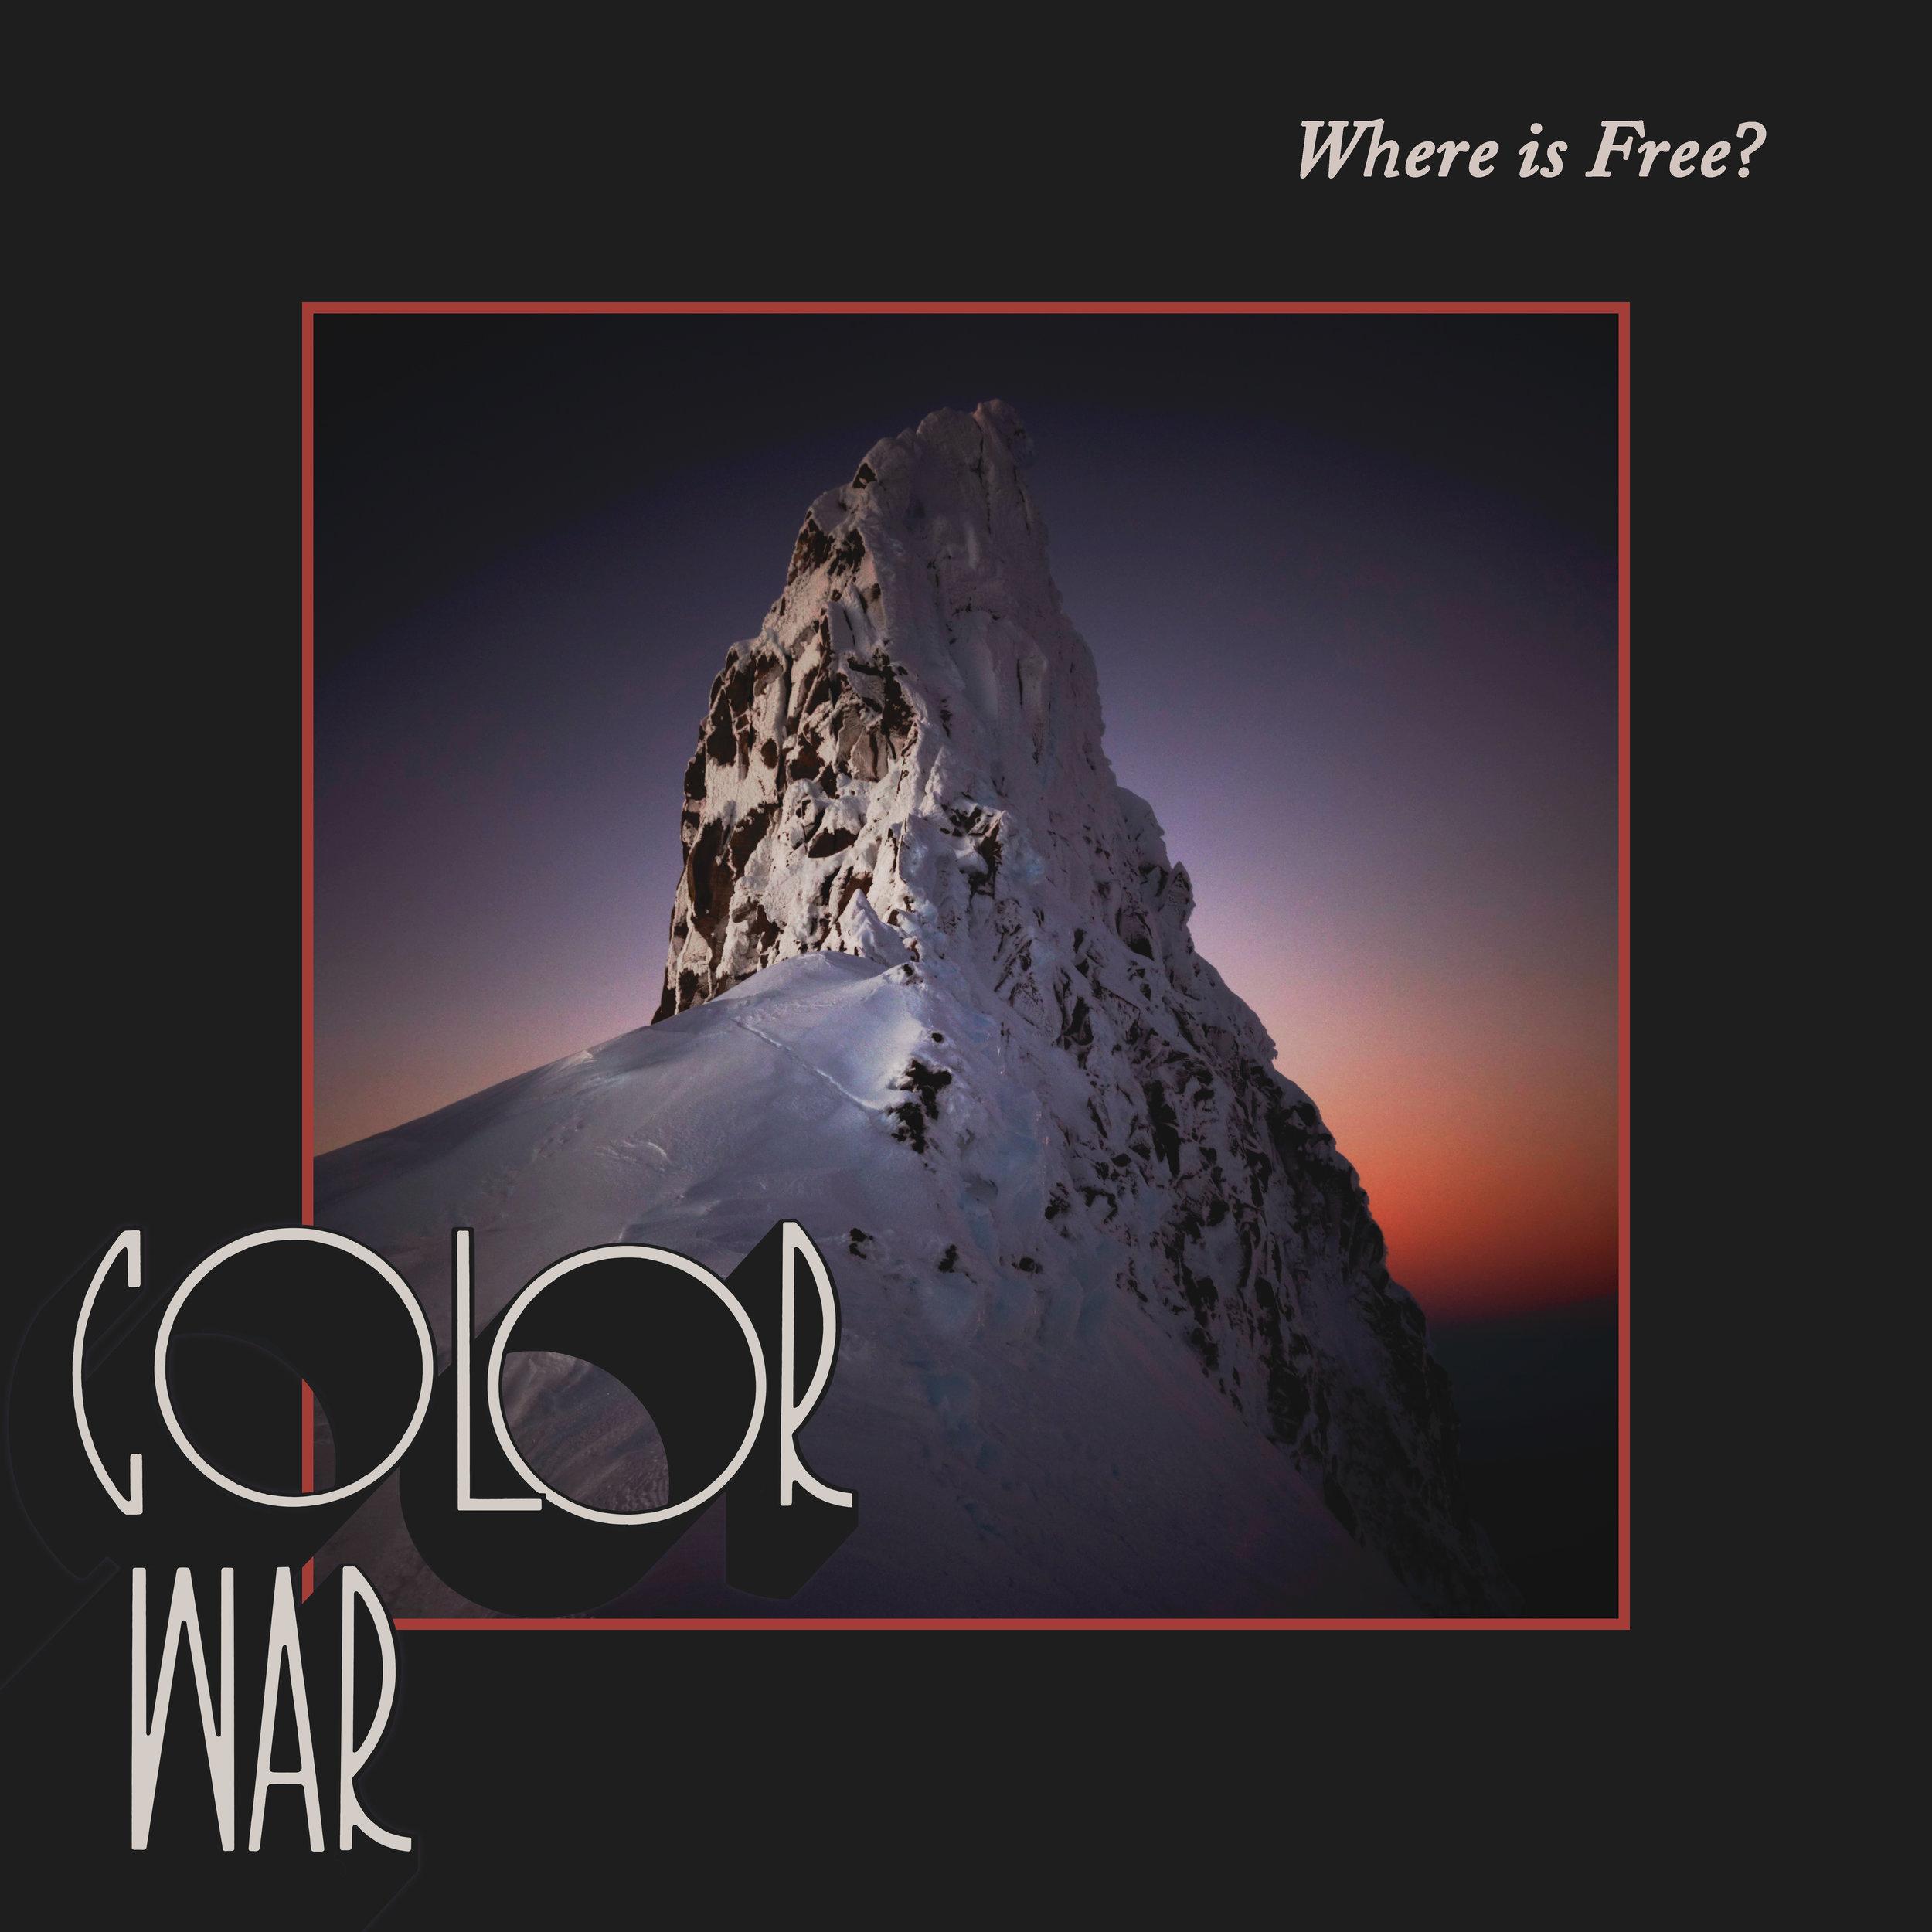 Where Is Free Album Artwork - Color War.jpg